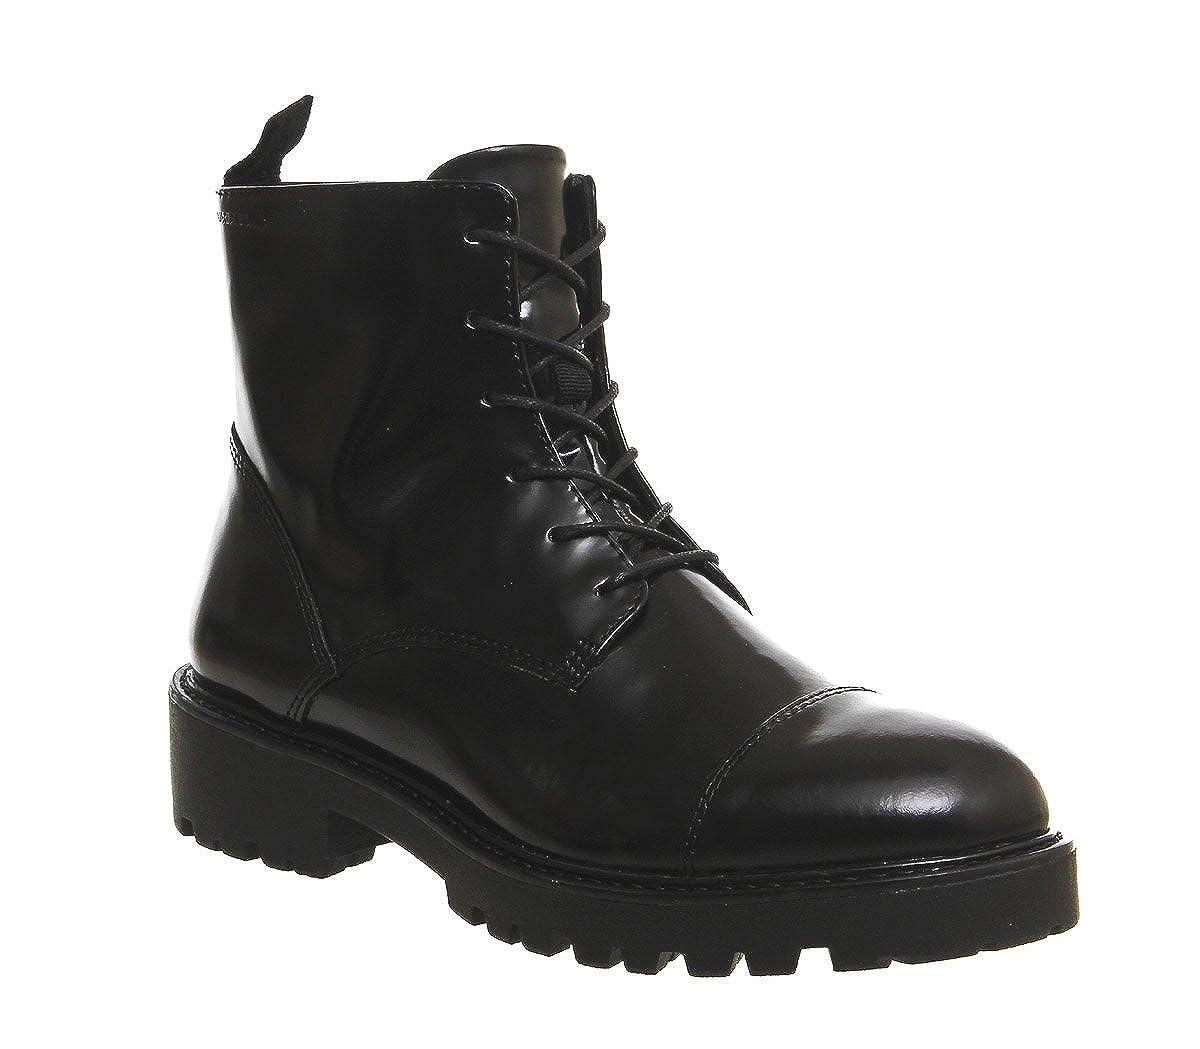 e9c549440ad Vagabond Kenova Boots Black Box Leather - 8 UK: Amazon.co.uk: Shoes ...